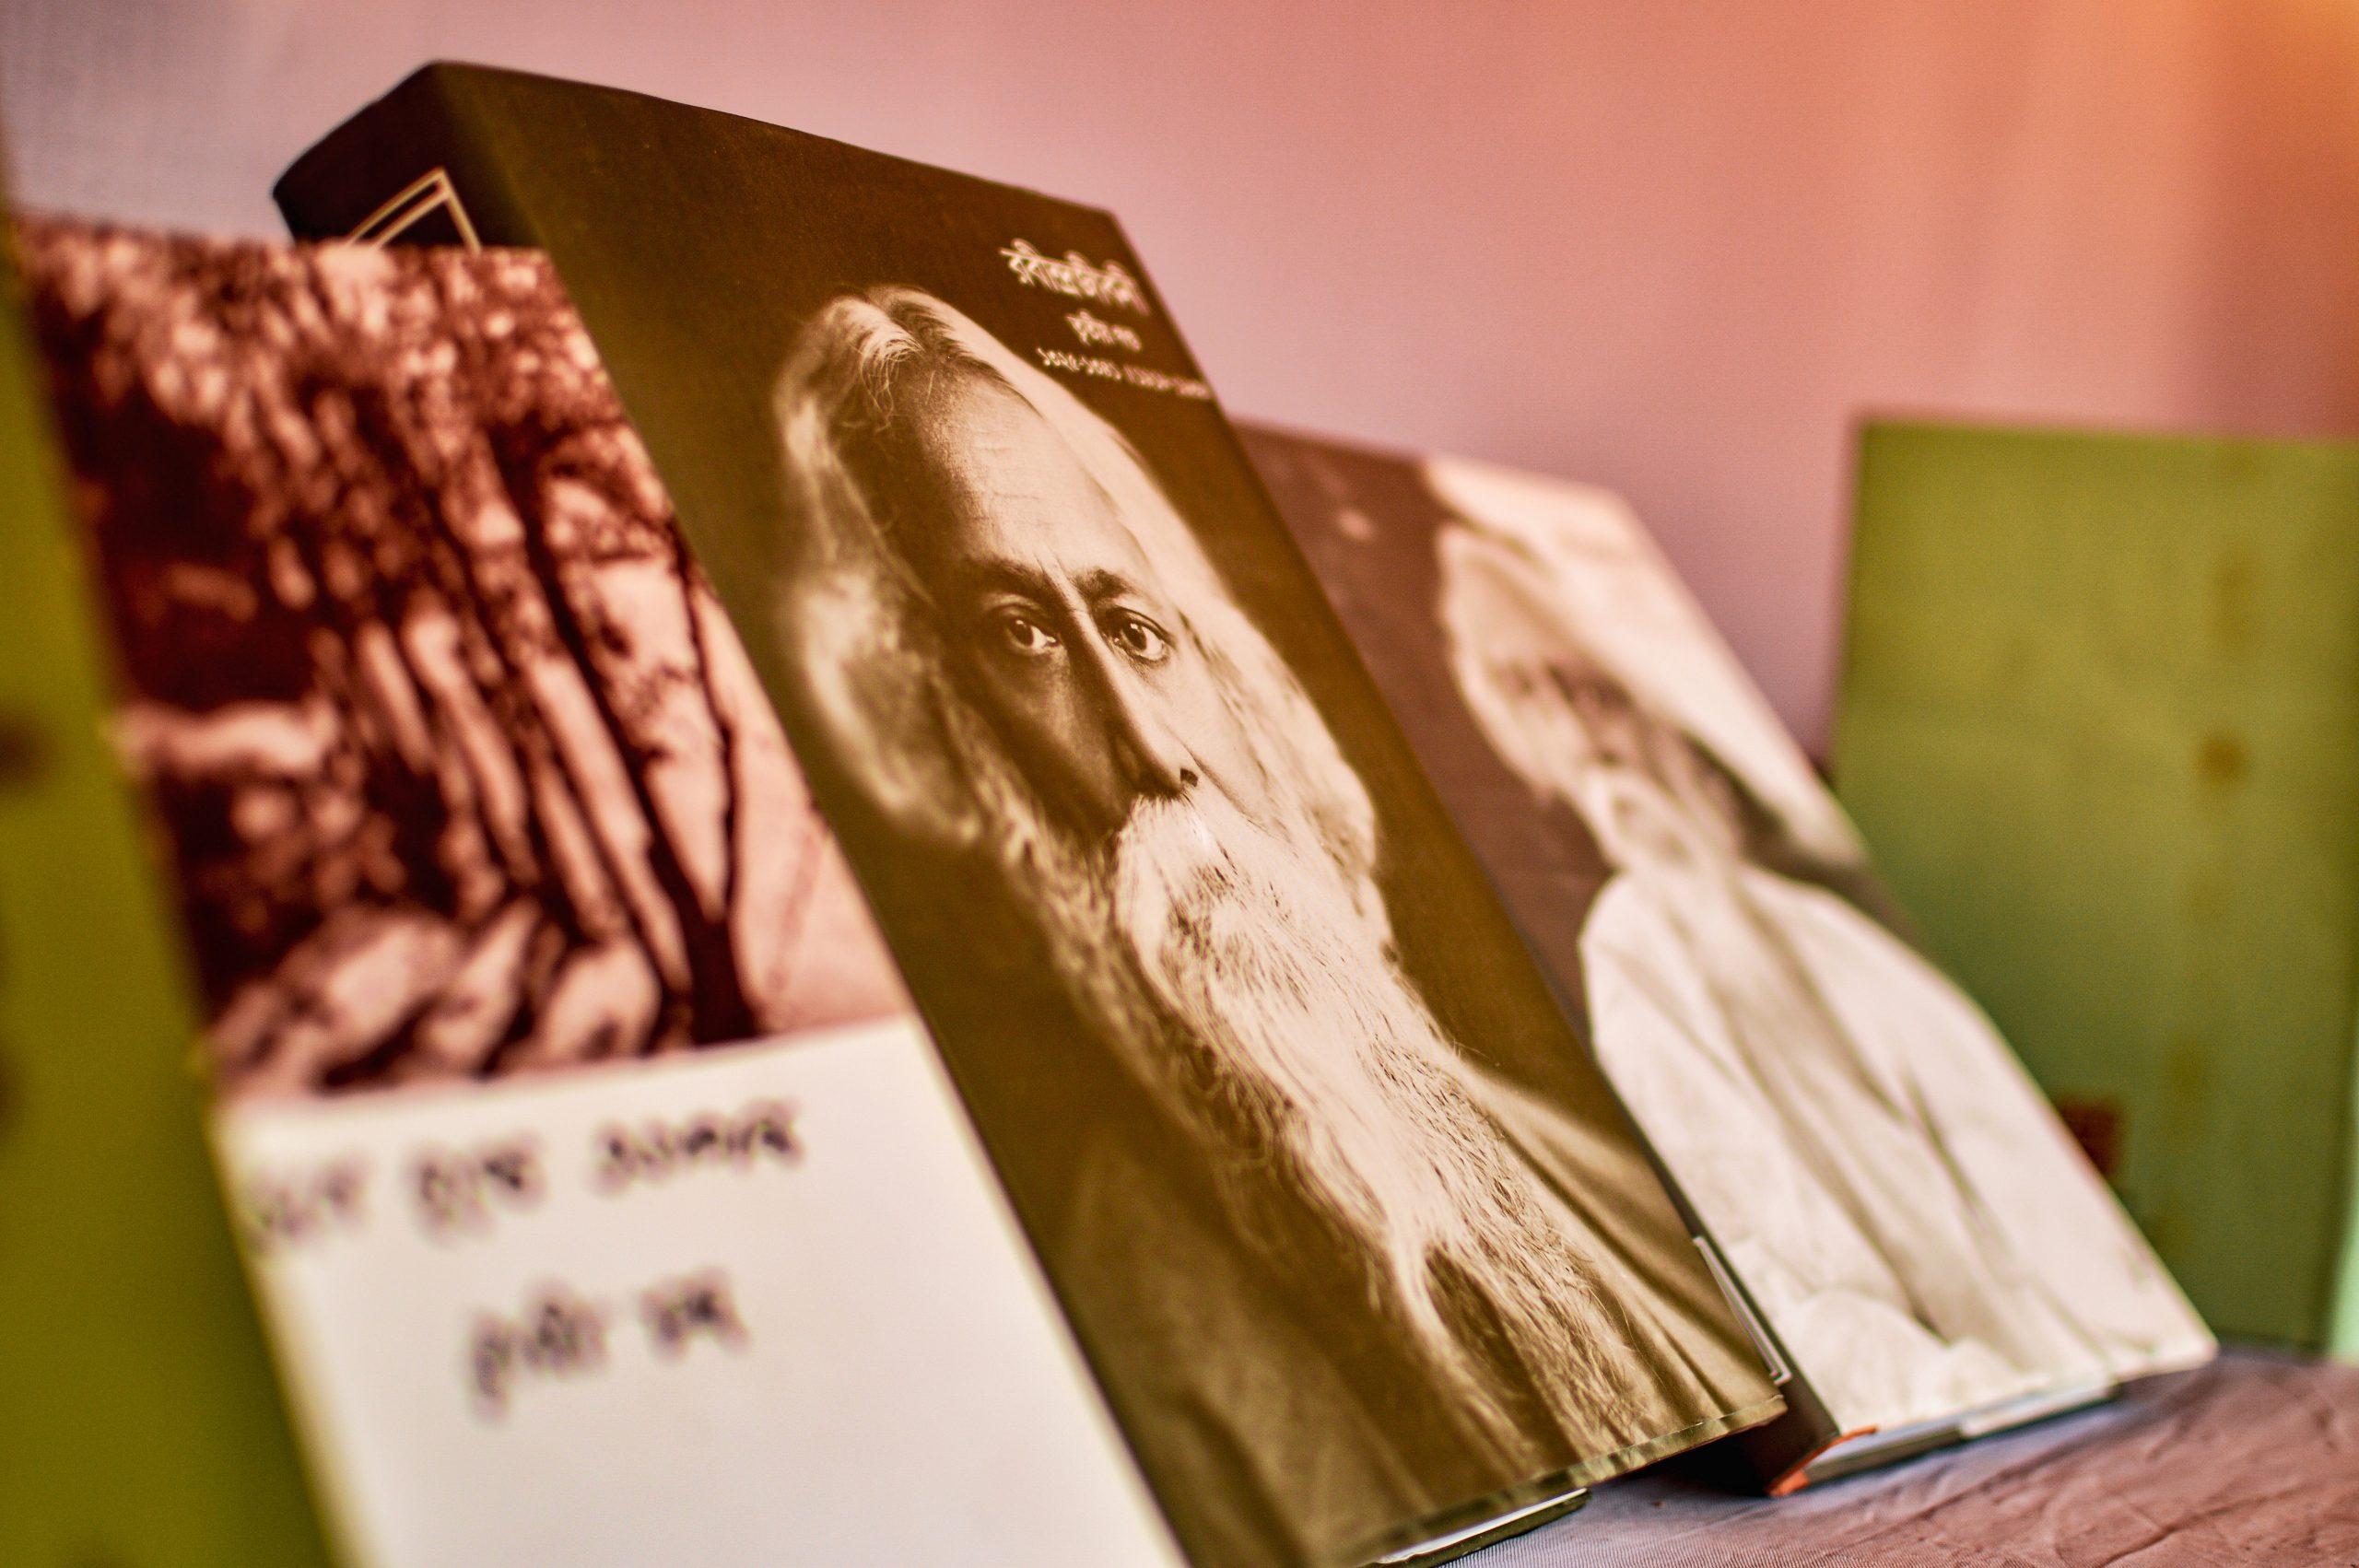 rabindranath tagore book